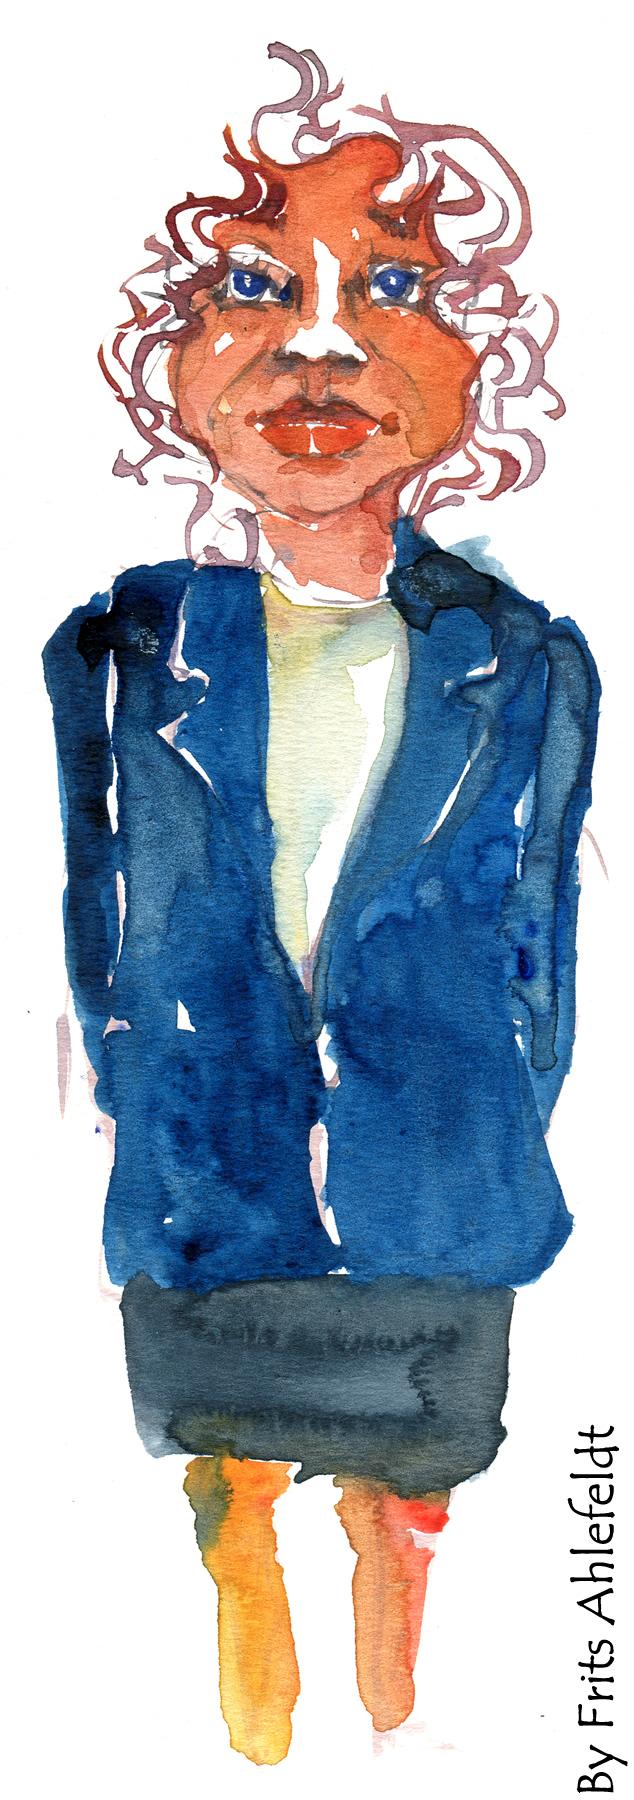 Grey hair. Businesswoman. Watercolor